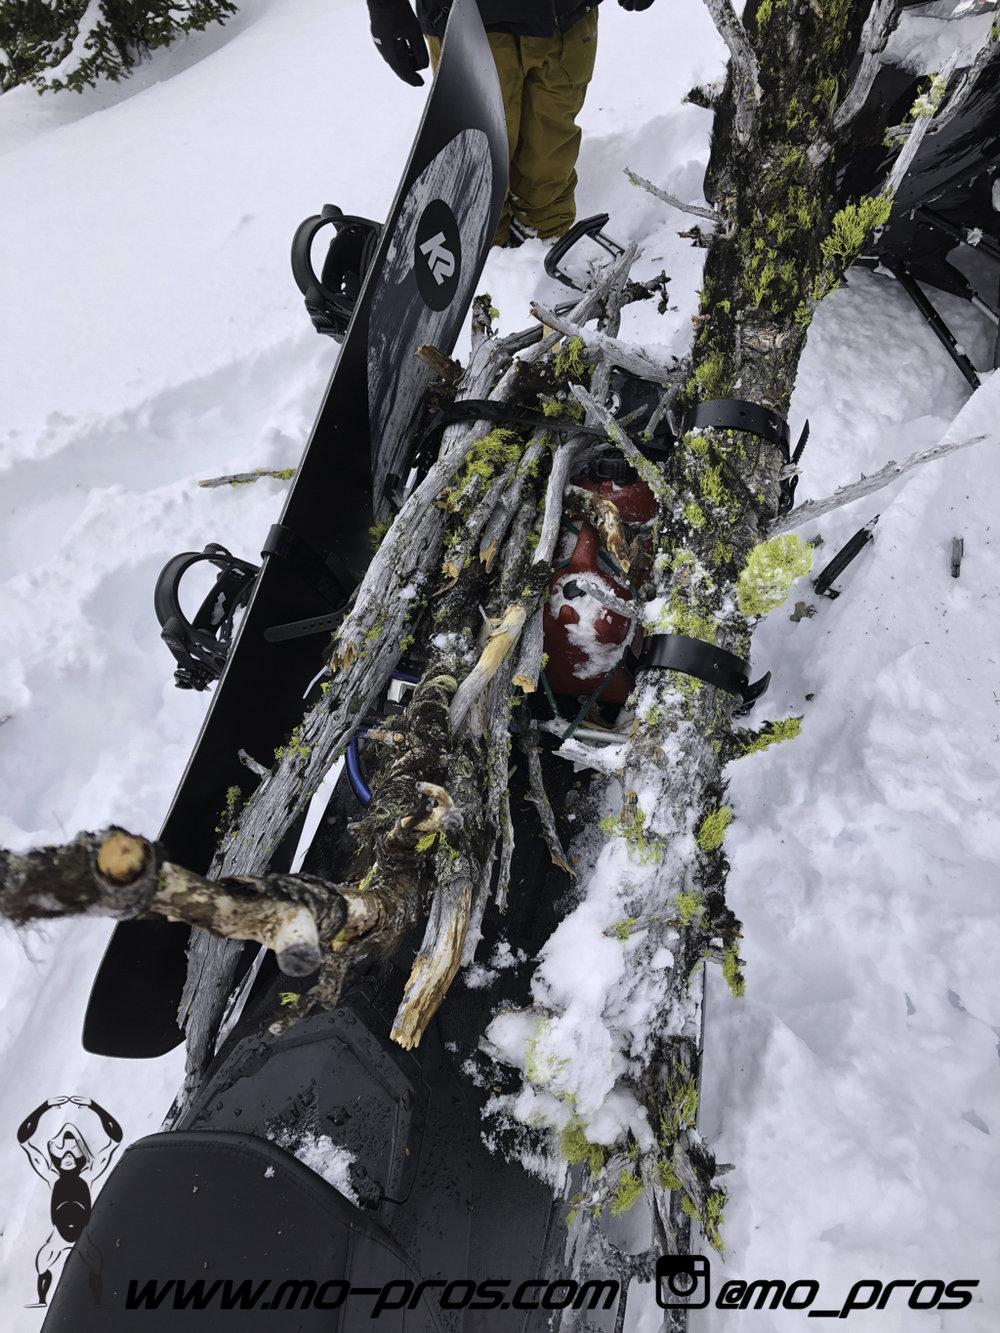 101_Backcountry _Backcountry United_CFR rack_Cheetah Factory Racing_gas Rack_Gear_Gun Rack_LinQ Snowboard Ski_Rack_Ski_Snowbike_snowboard_Snowboard rack_Snowboarding_Snowmobile_snowmobile bag_timbers.jpg